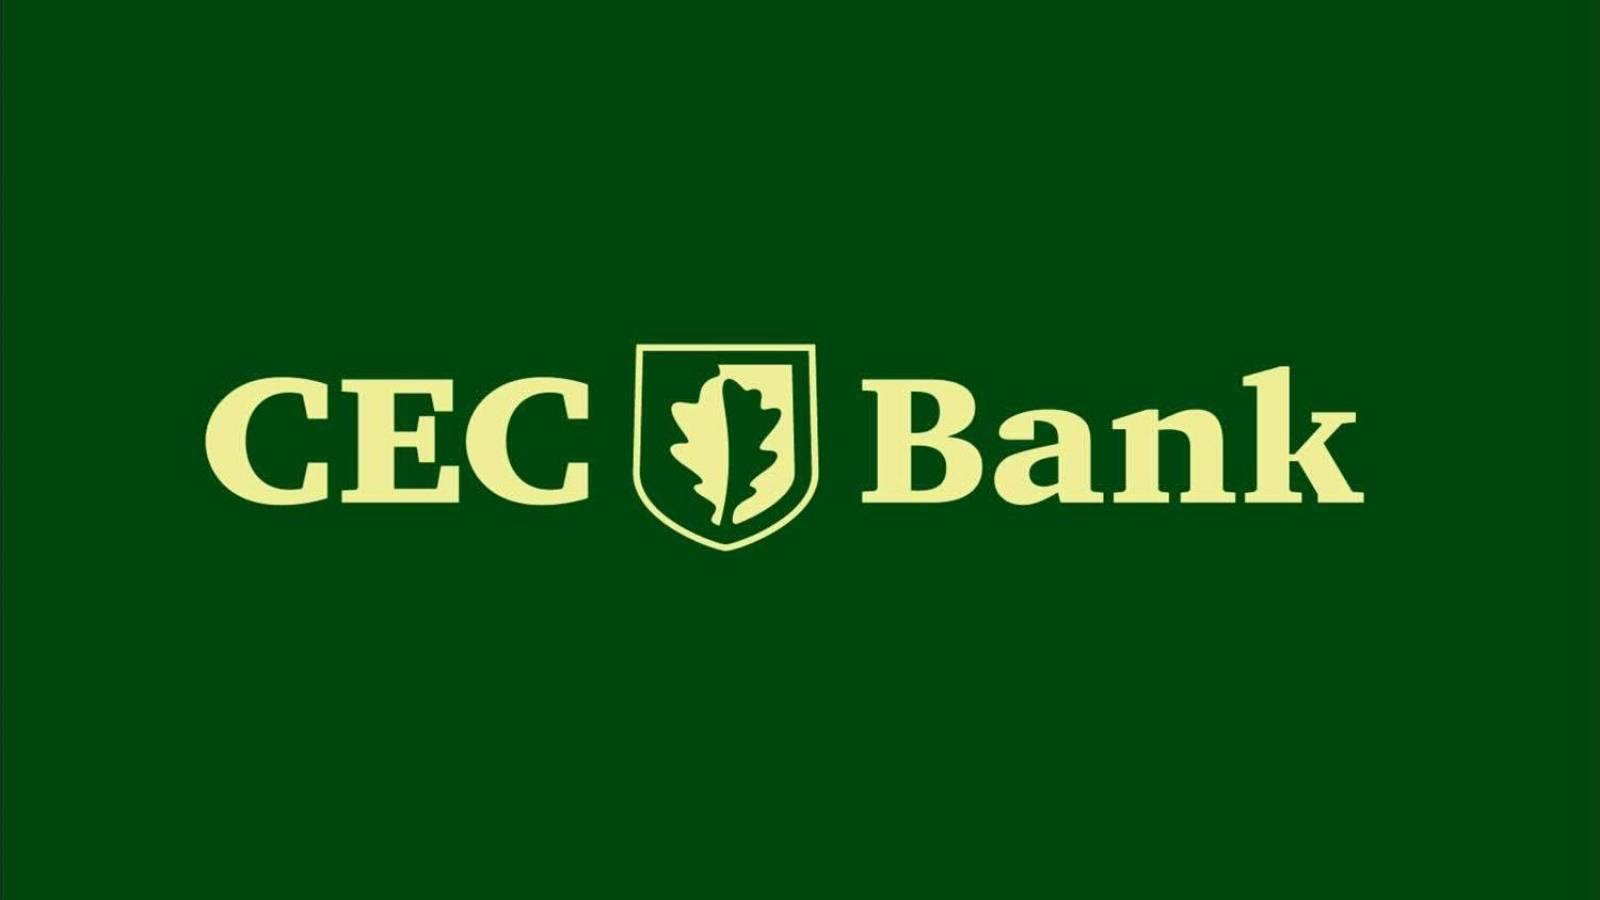 CEC Bank apple